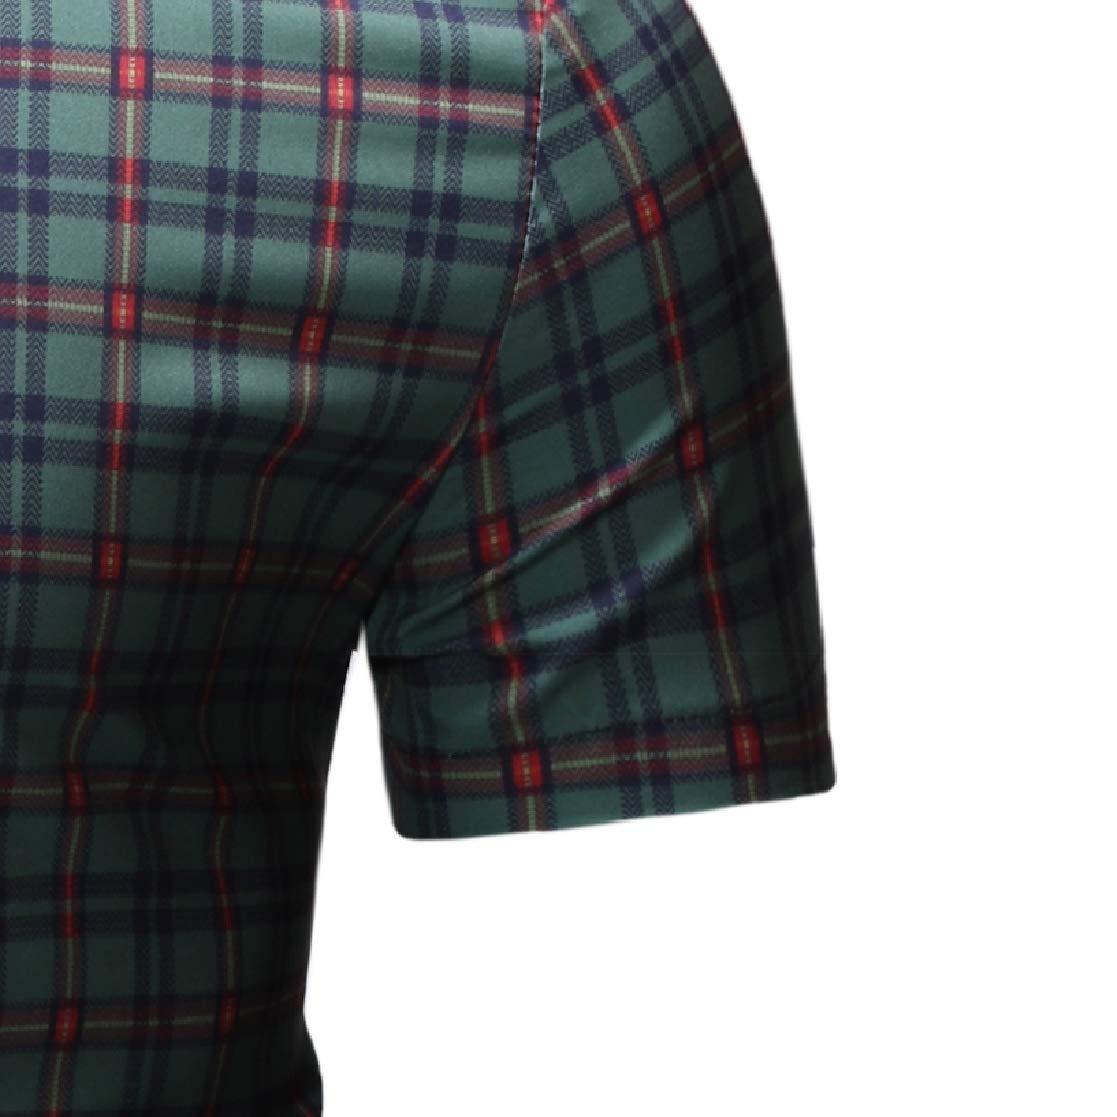 YUNY Mens Oversize Short-Sleeve Britain Plaid Summer Tee Polo Shirt Green 2XL